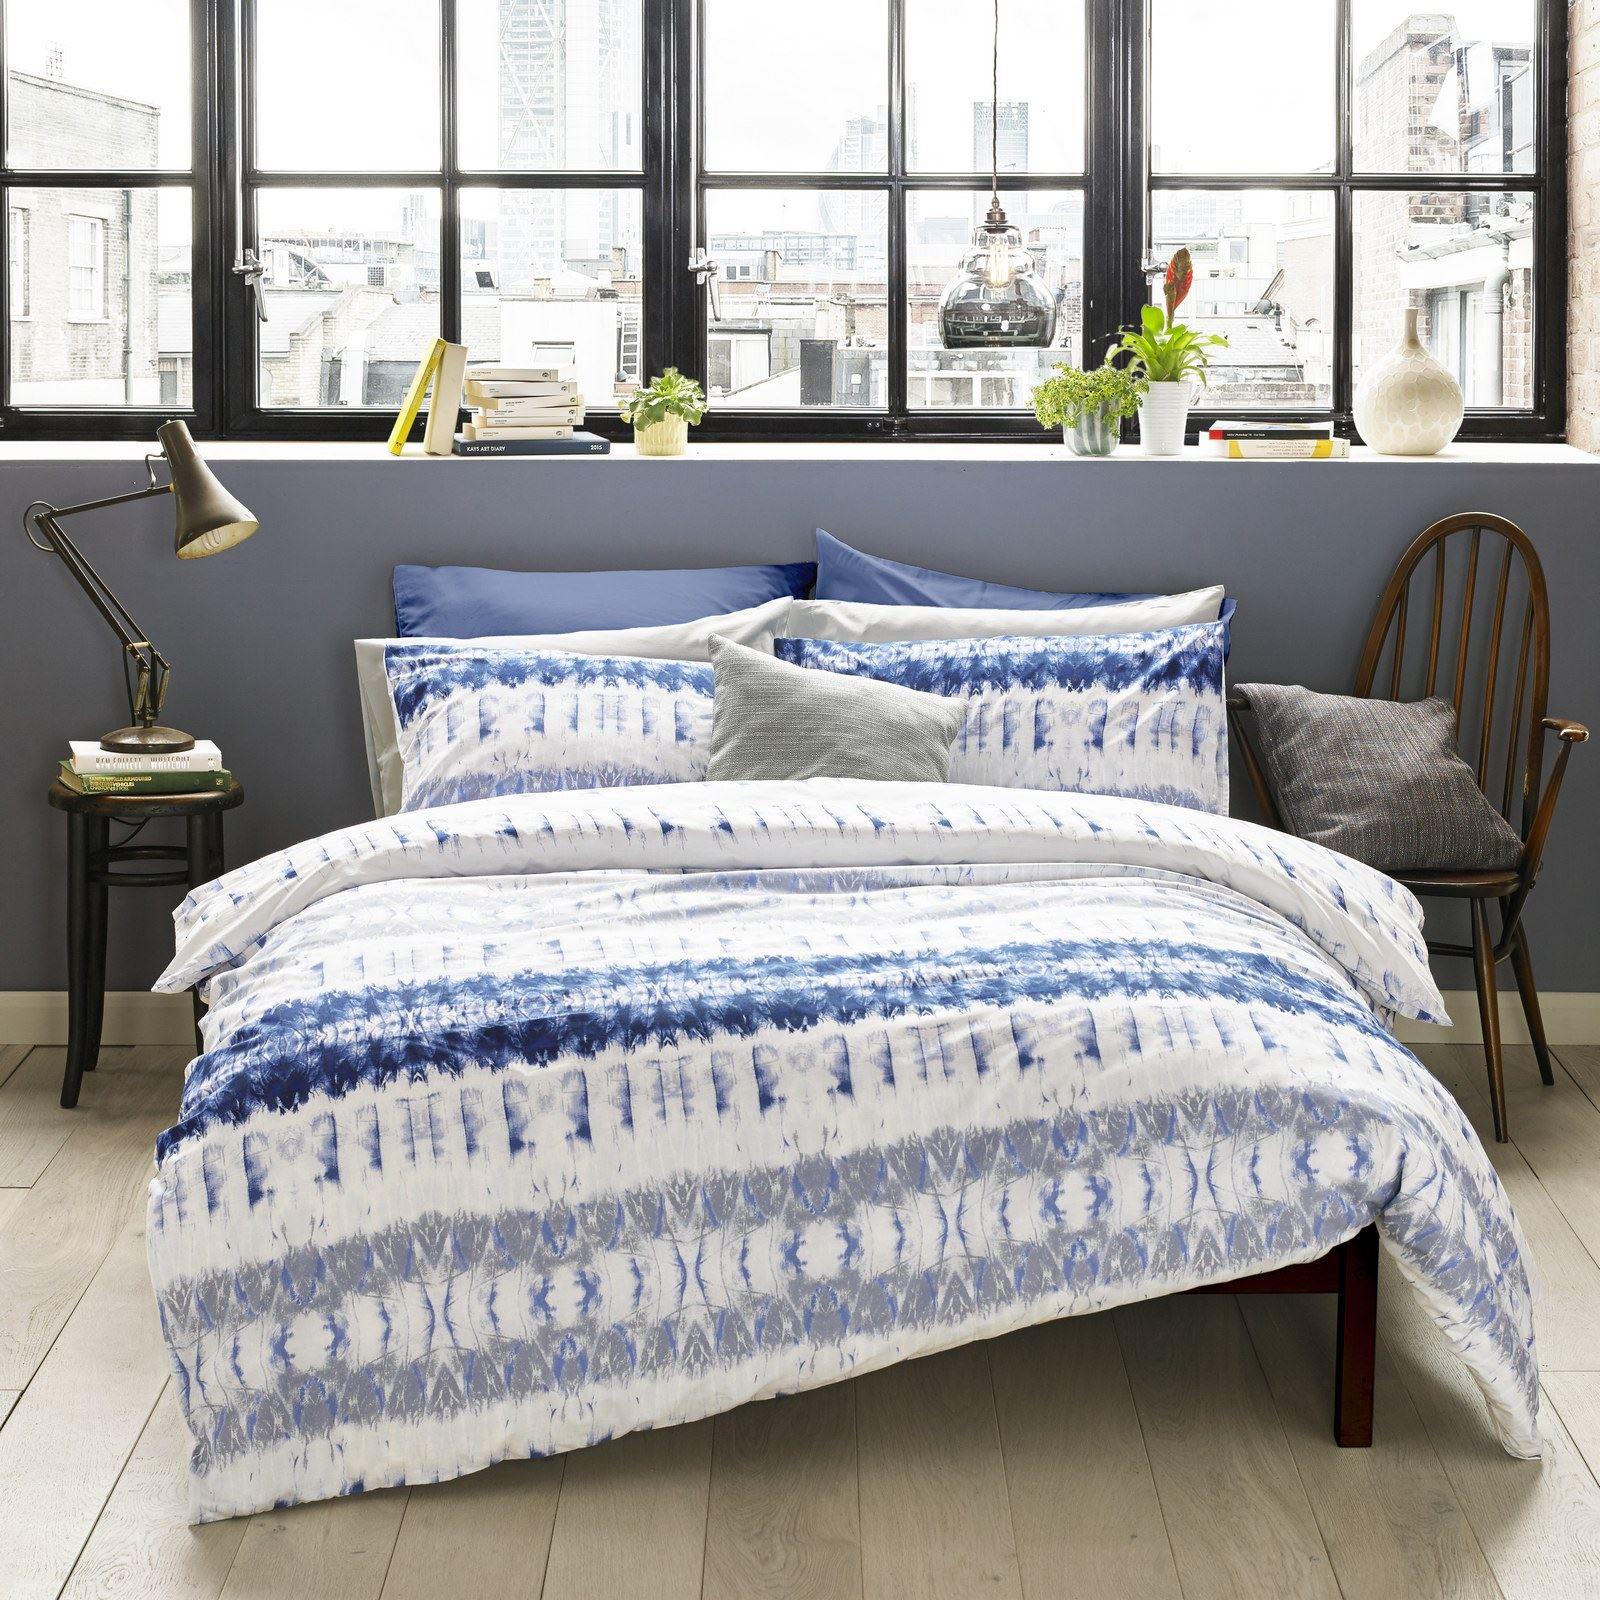 duvet cover pillowcase bedding bed